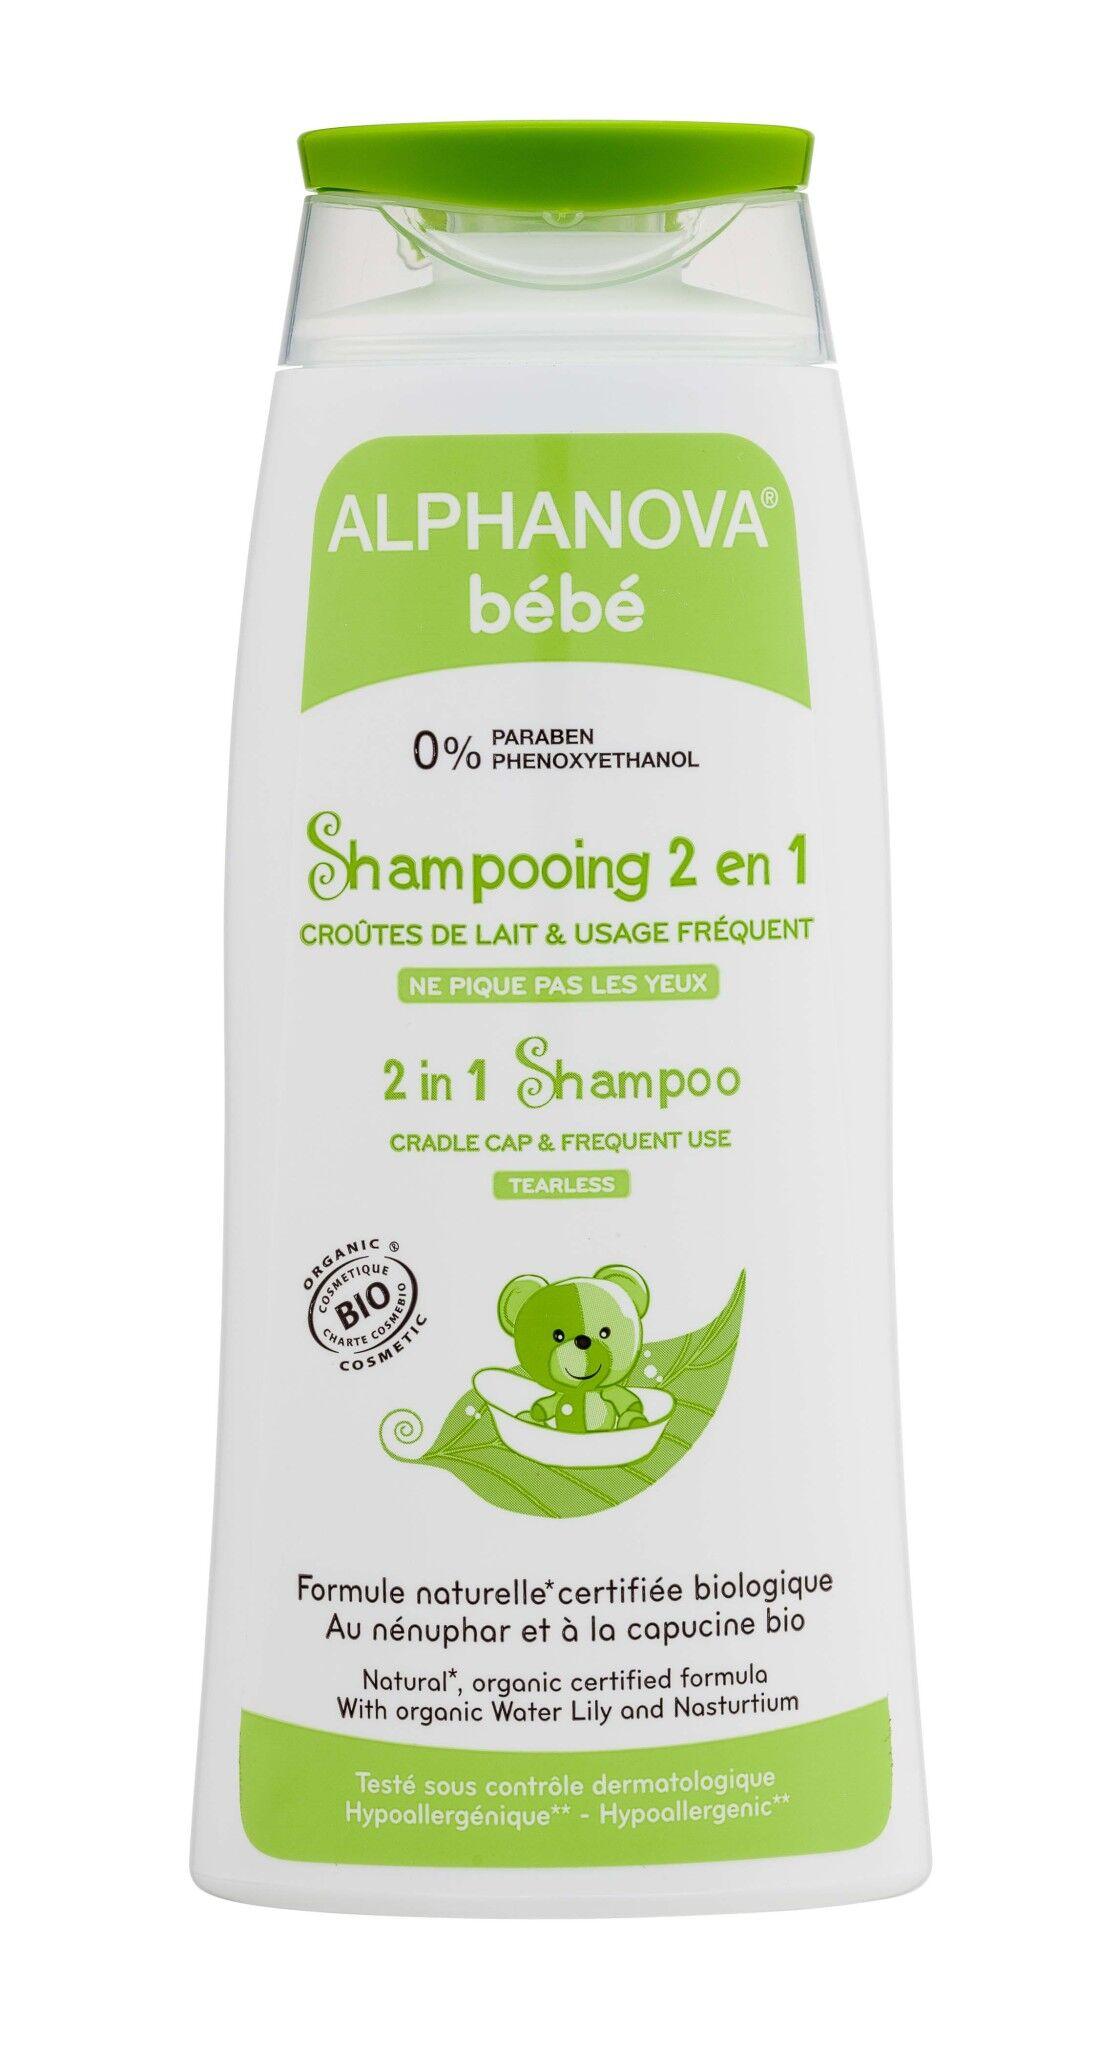 Alphanova shampooing 2 en 1 200ml